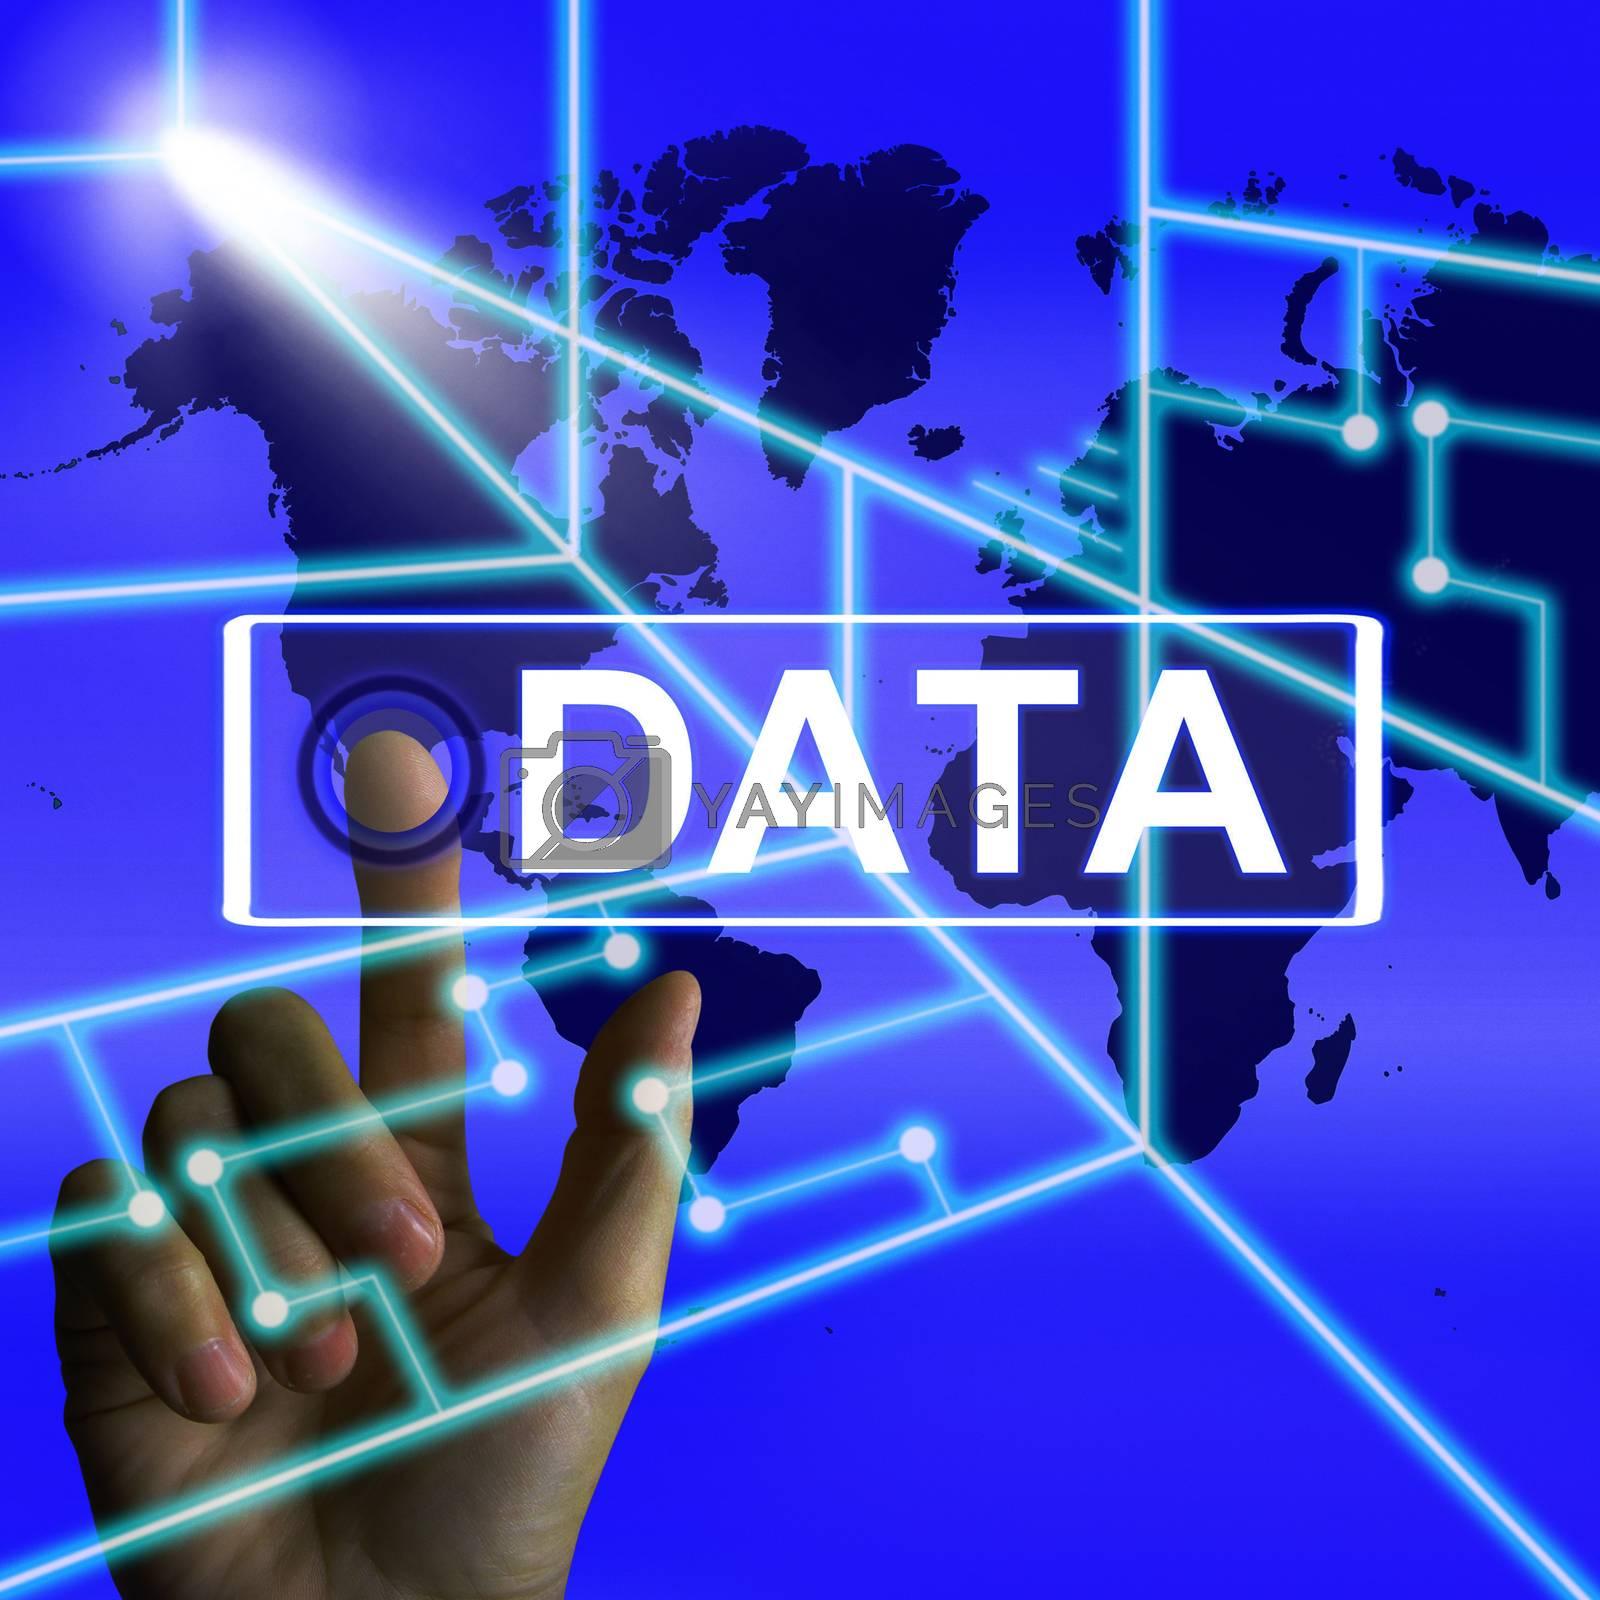 Data Screen Infers an International or Worldwide Database by stuartmiles